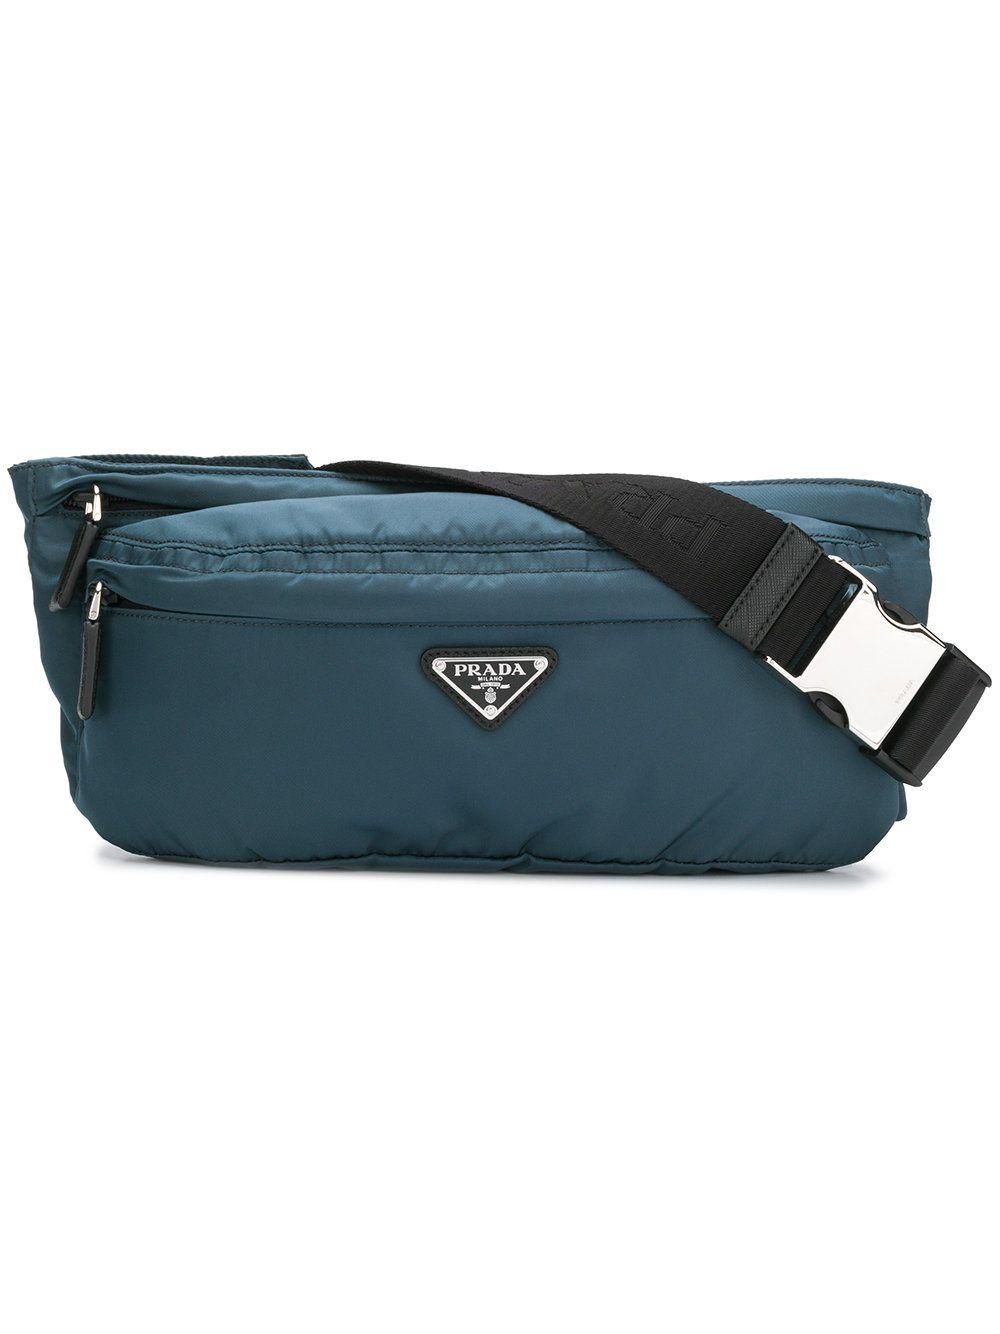 794c9c13afb3 Prada Shell belt bag